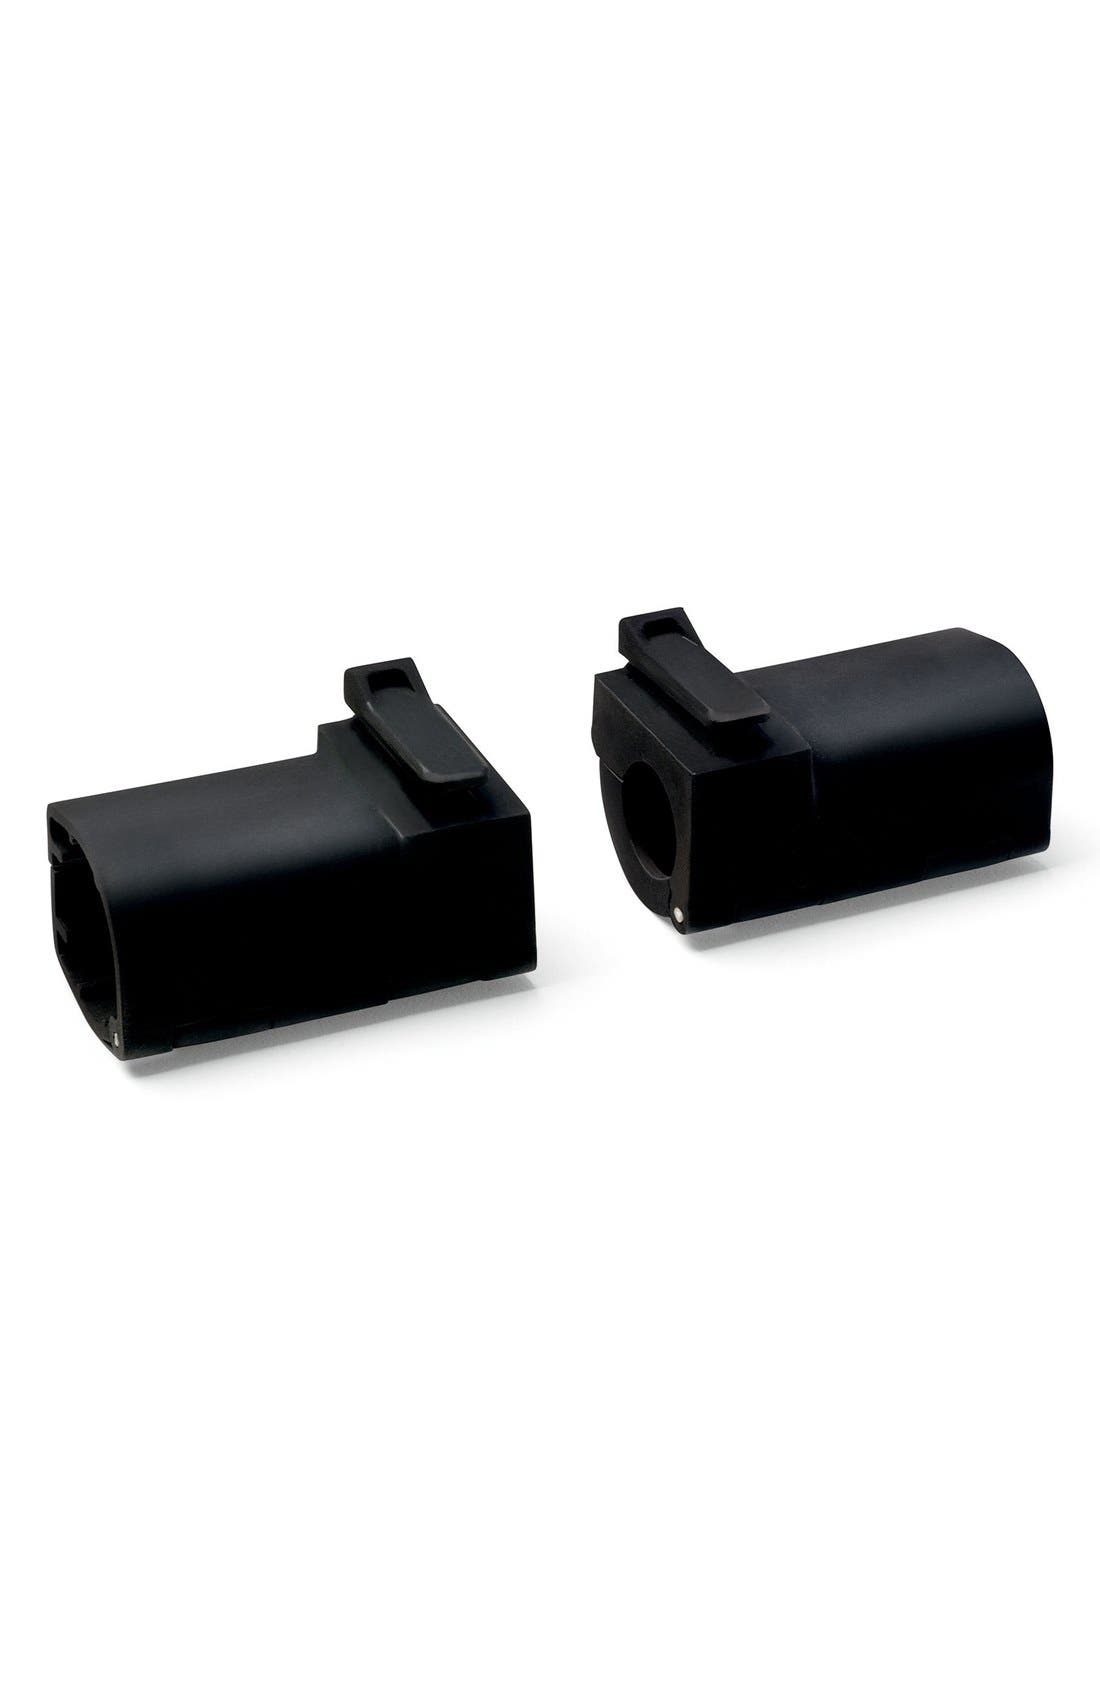 Infant Bugaboo Cameleon3 2015 Comfort Wheeled Board Adapter Size One Size  Black